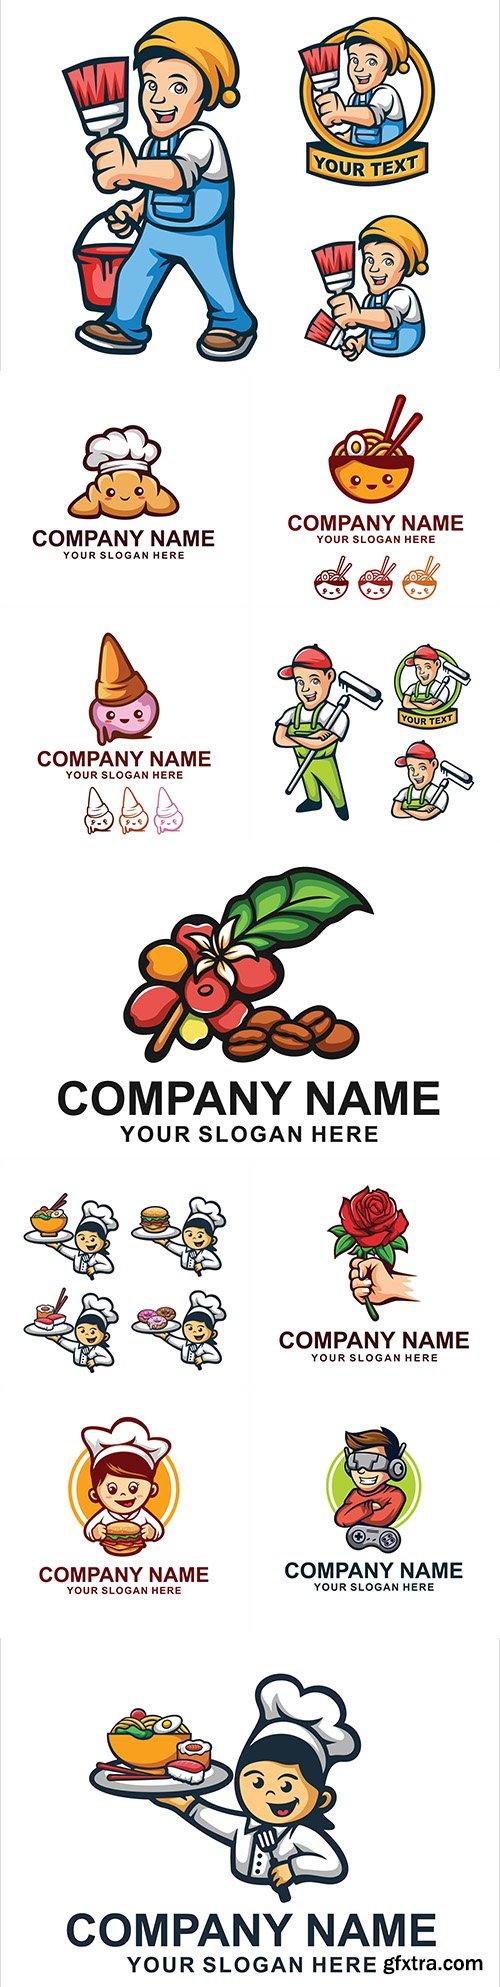 Brand name company business corporate logos design 28